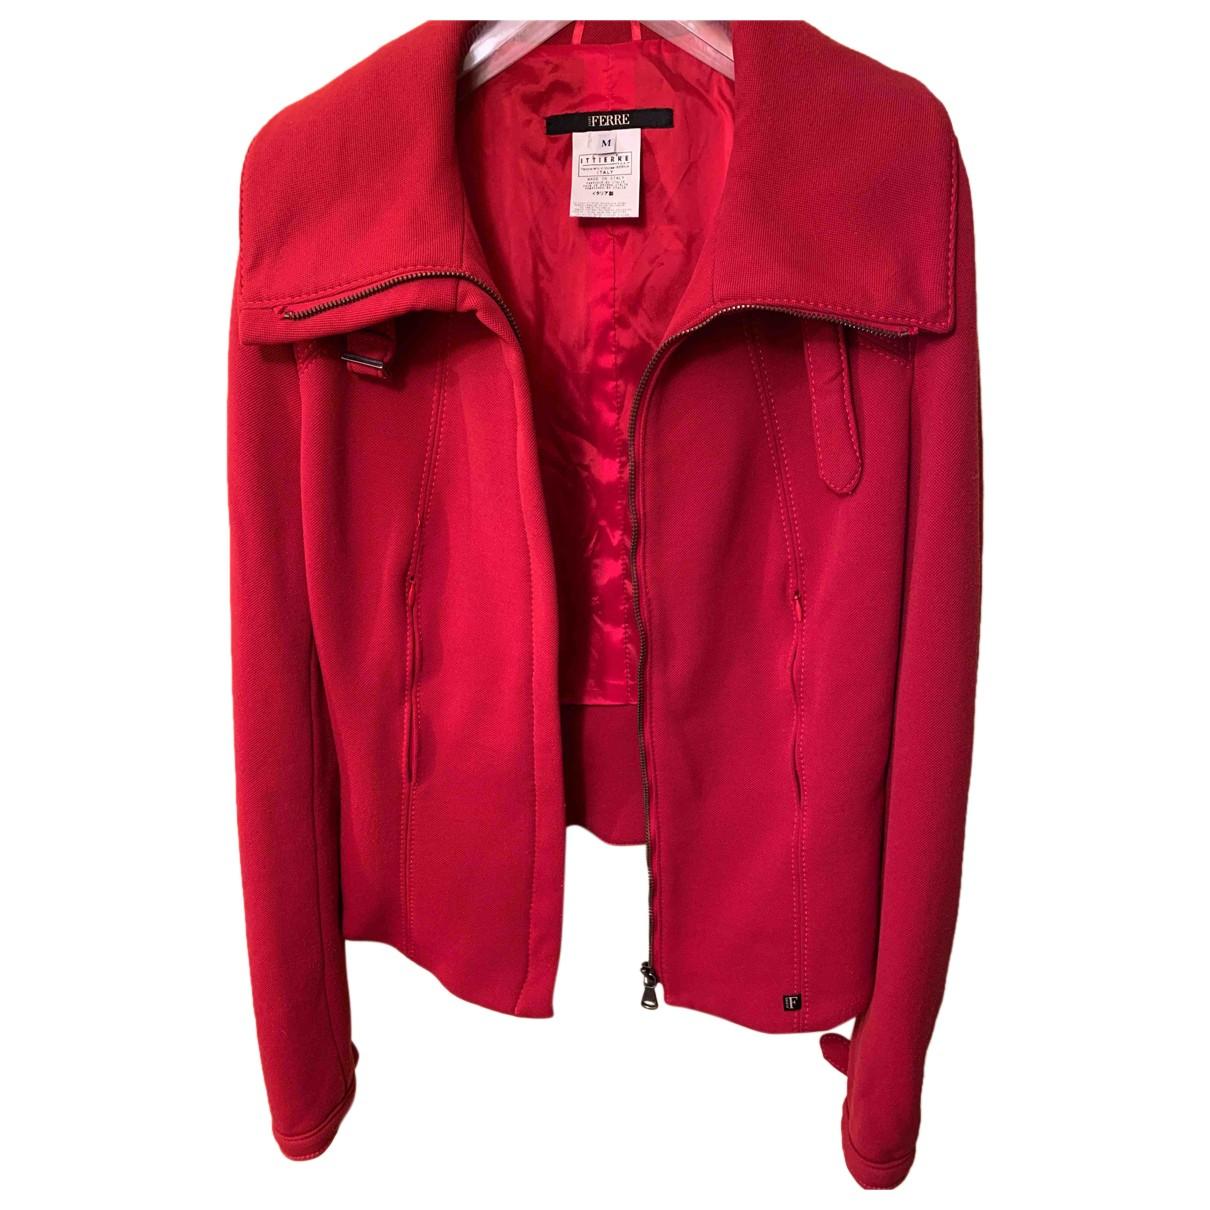 Gianfranco Ferre \N Jacke in  Rot Polyester